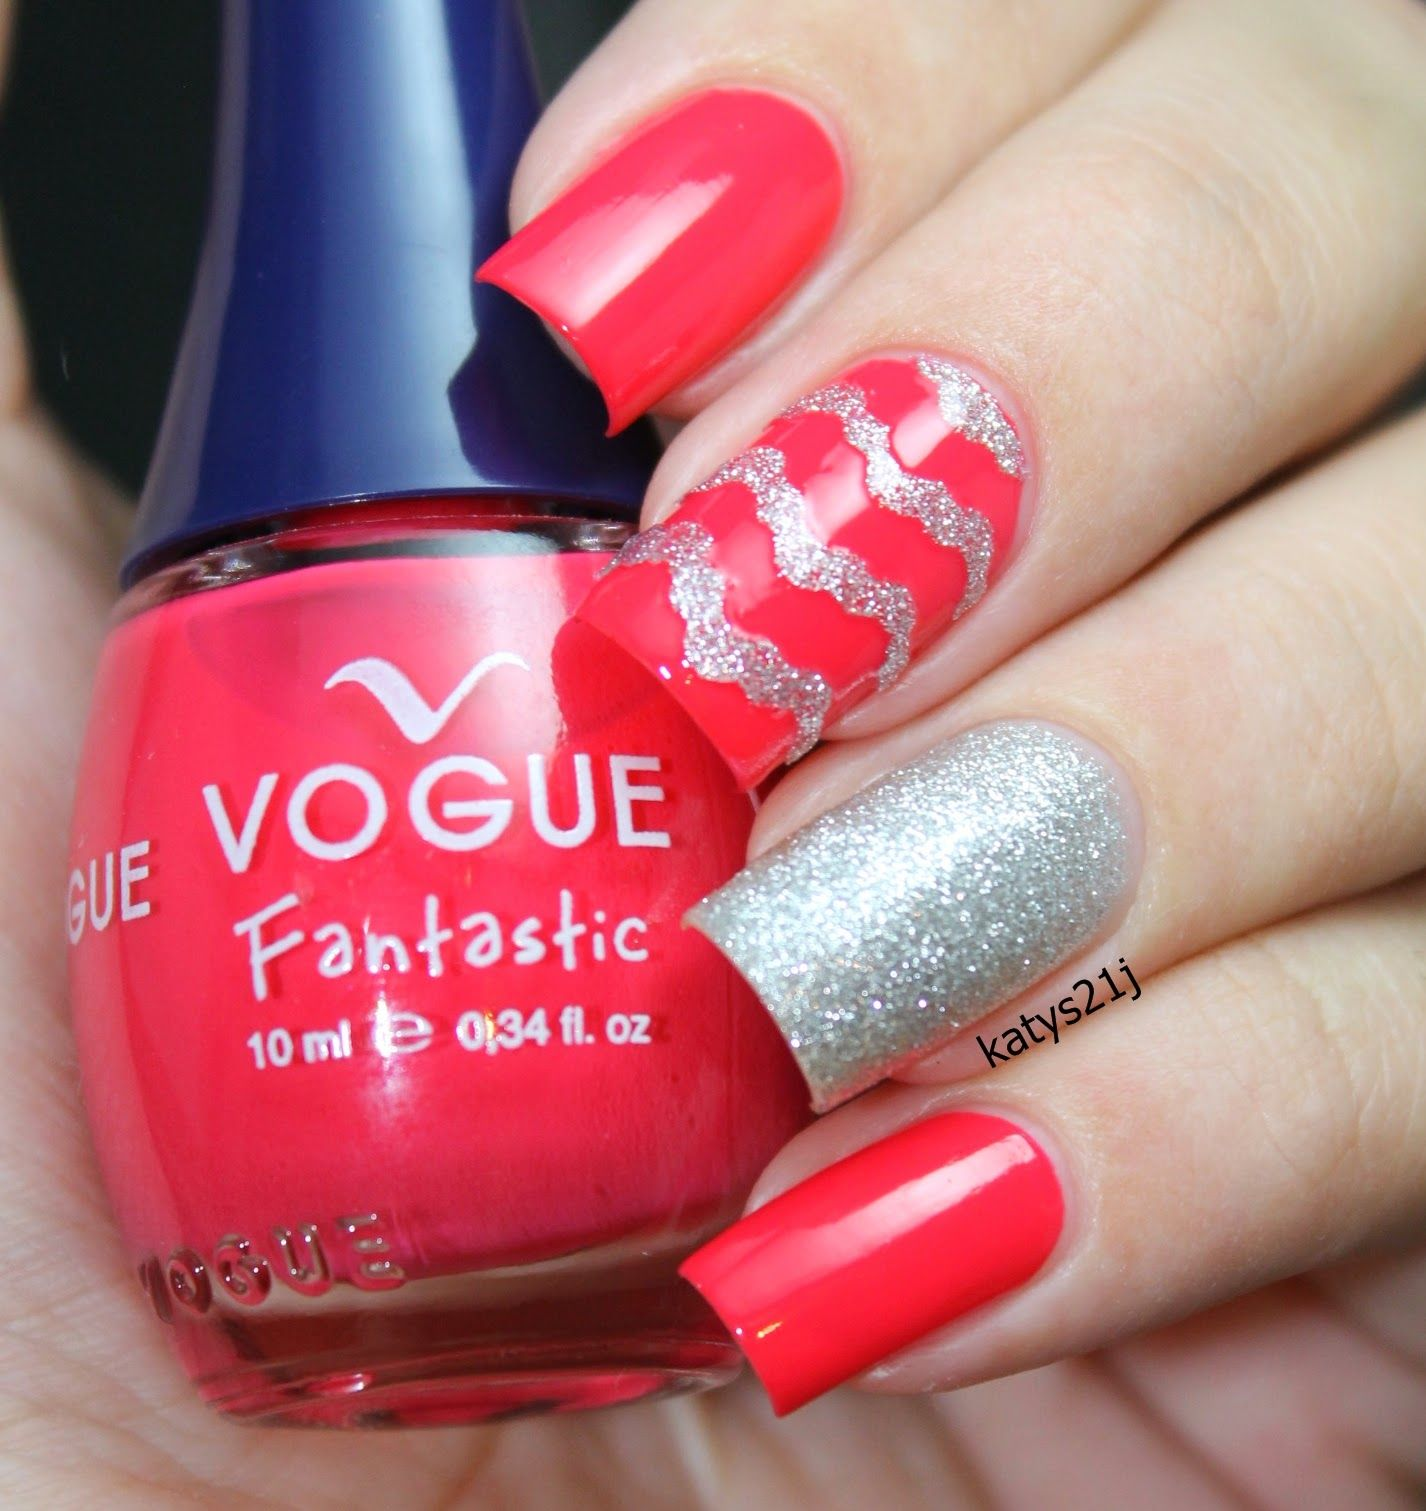 My Nail Art Journal: Frenesi De Vogue Fantastic \